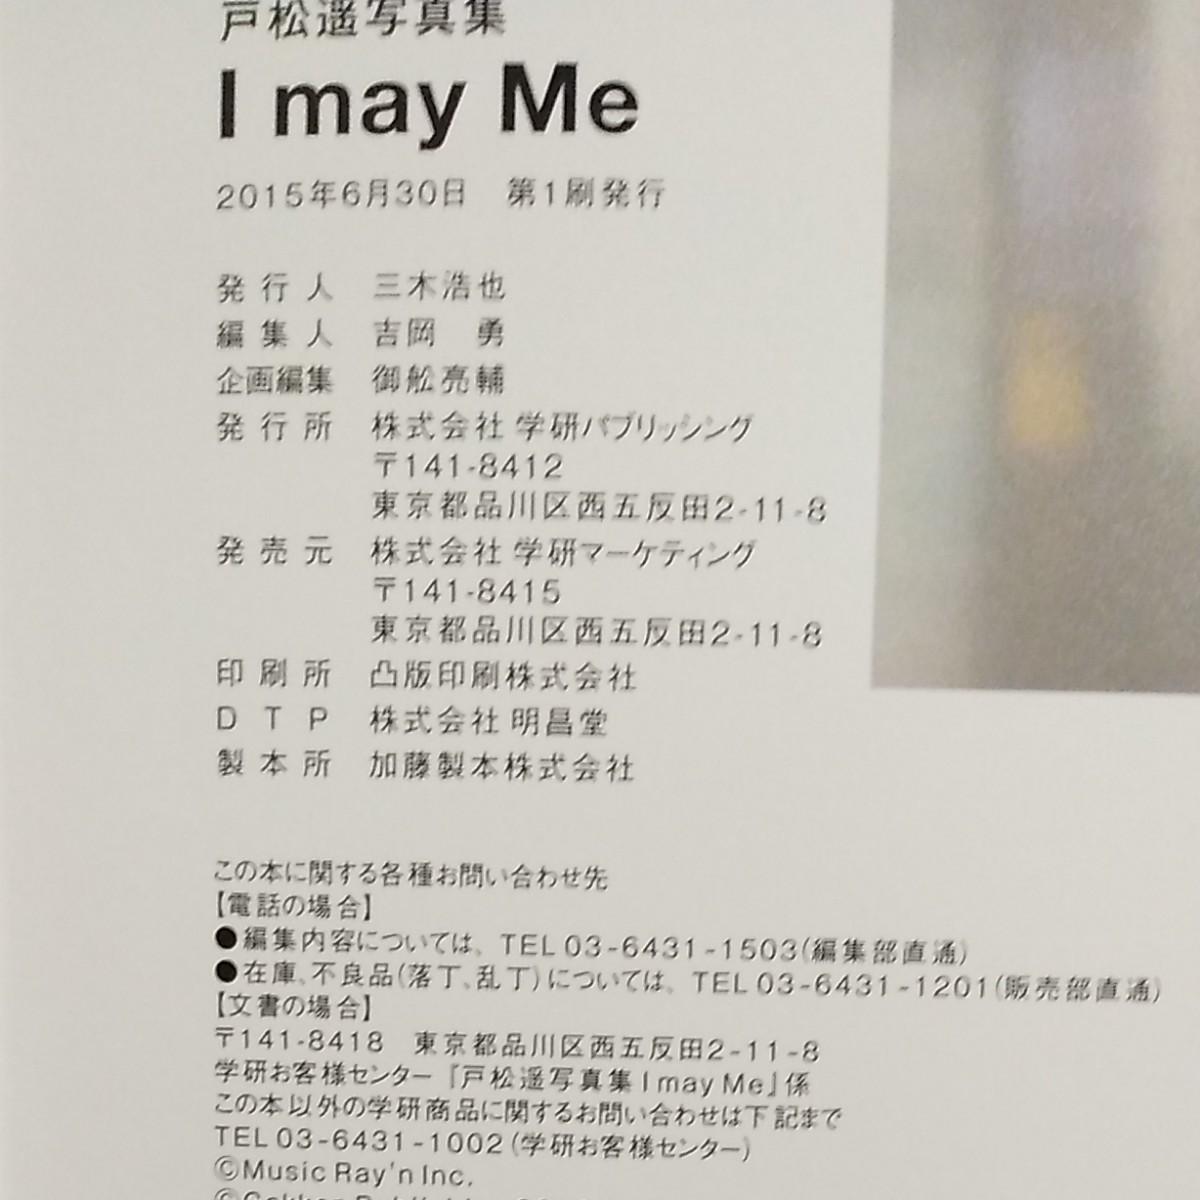 【初版、帯付き】戸松遥 写真集 I may me